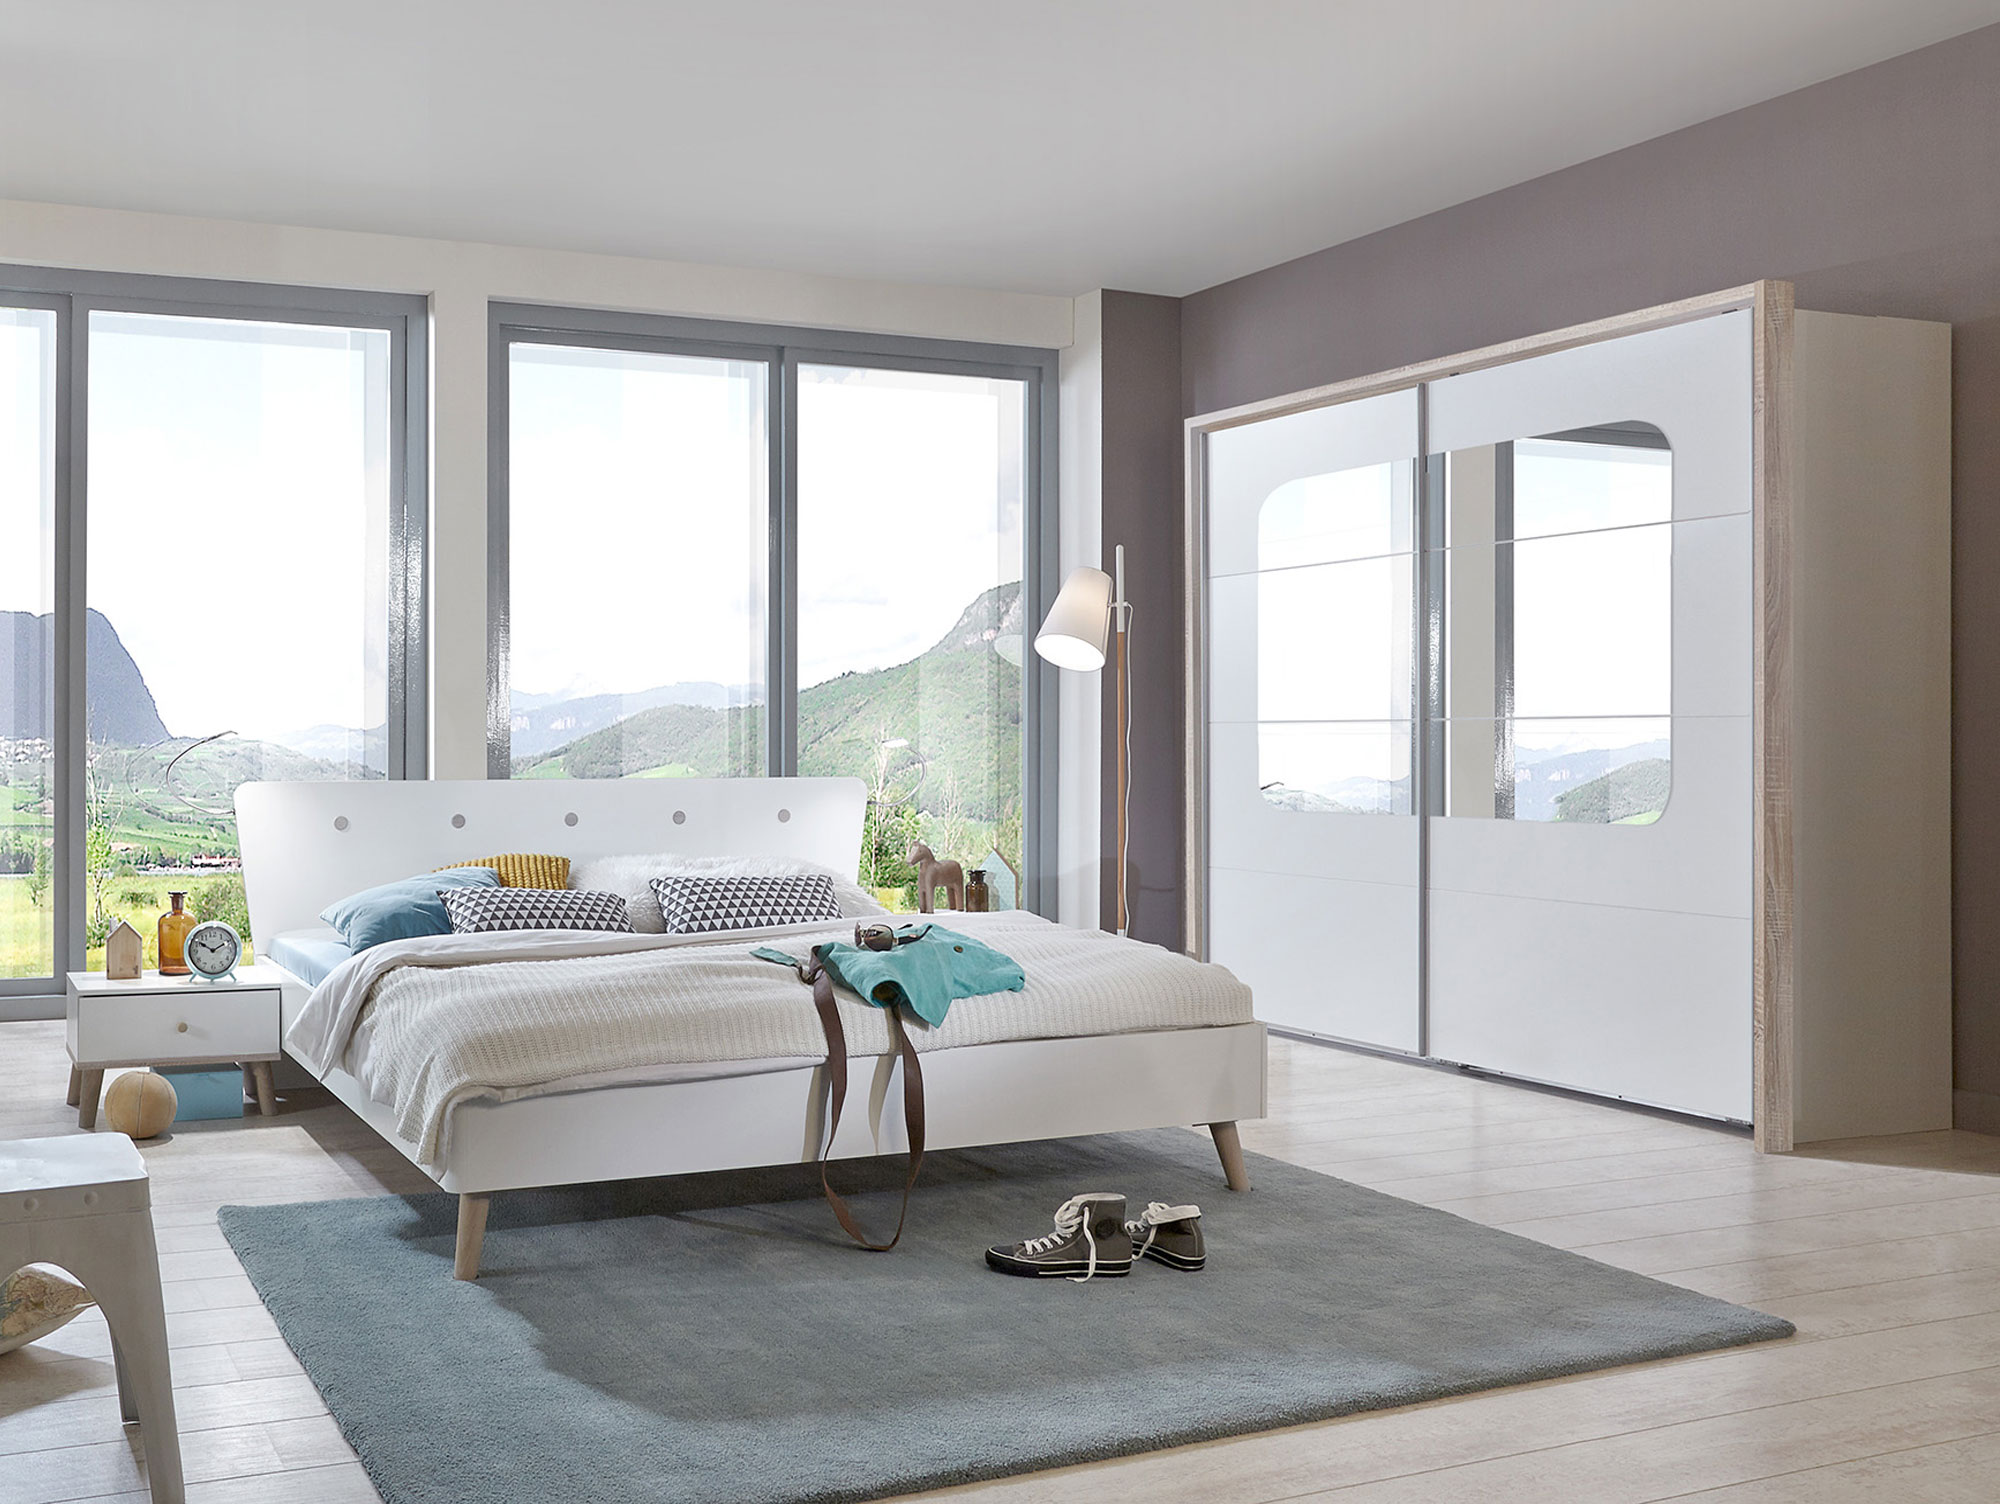 batida futonbett 140 x 200 cm weiss eiche s gerau dekor. Black Bedroom Furniture Sets. Home Design Ideas